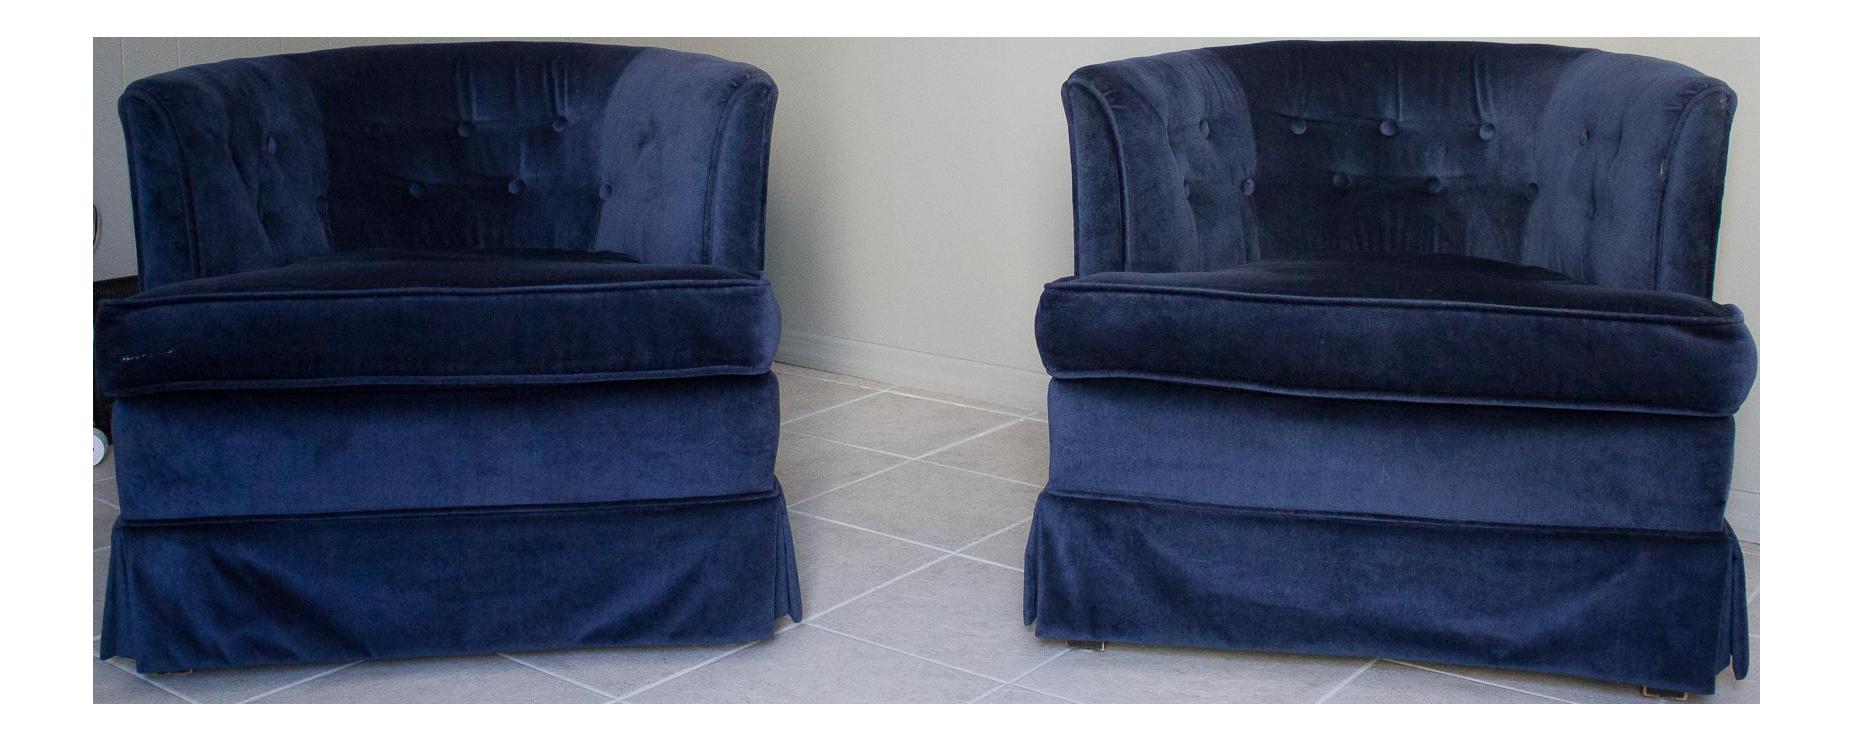 Navy Blue Velvet Barrel Chairs   A Pair